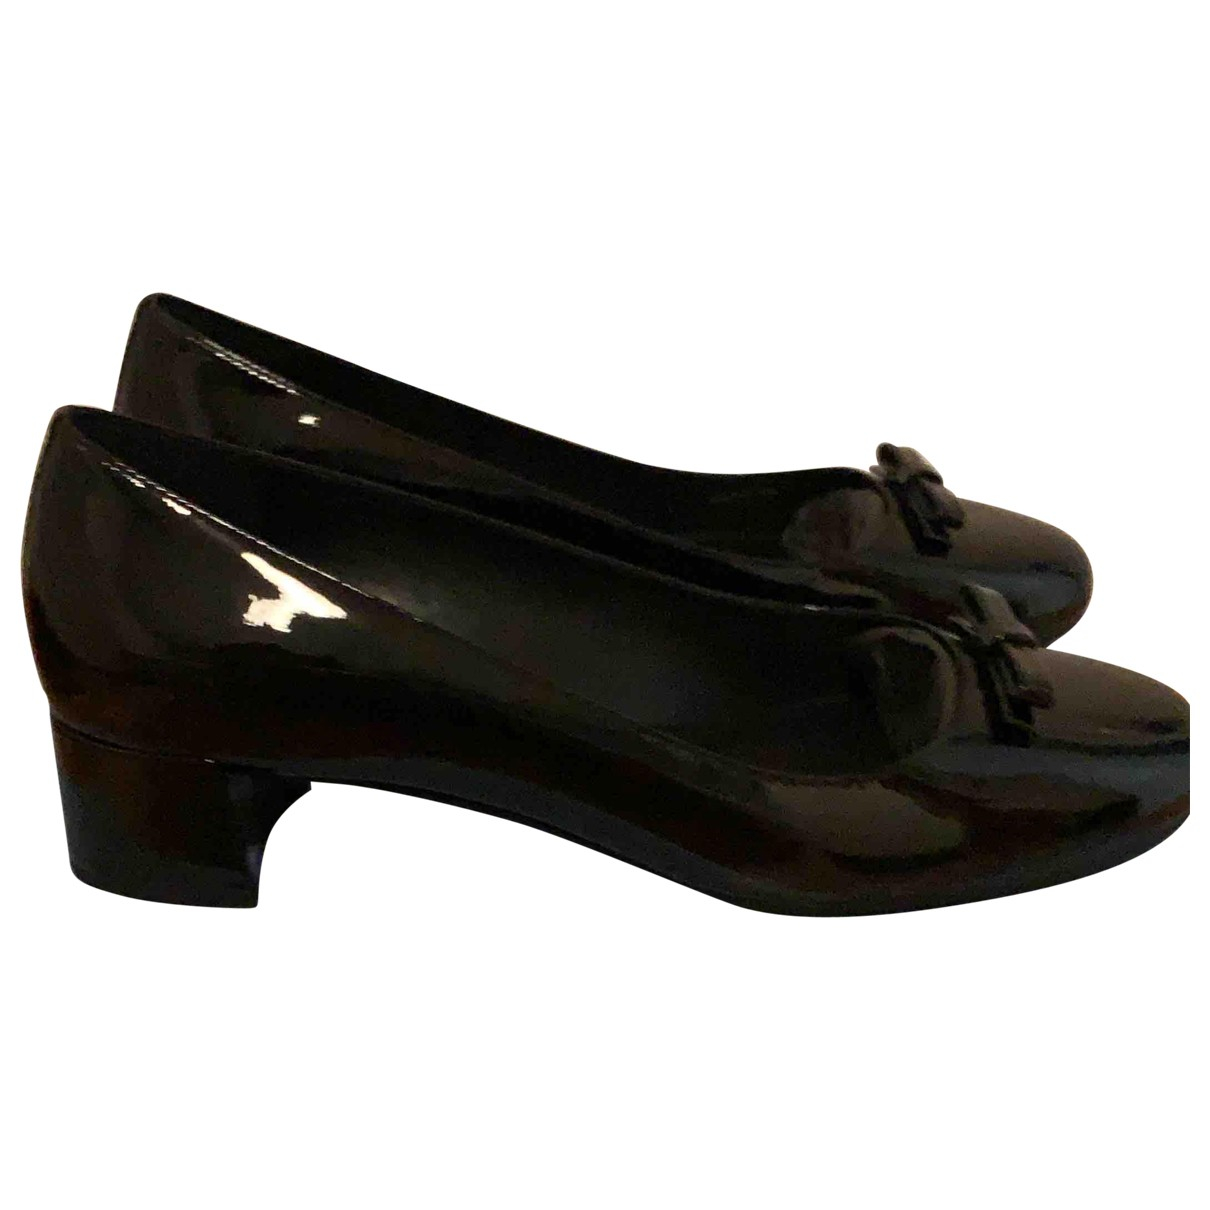 Prada - Ballerines   pour femme en cuir verni - noir